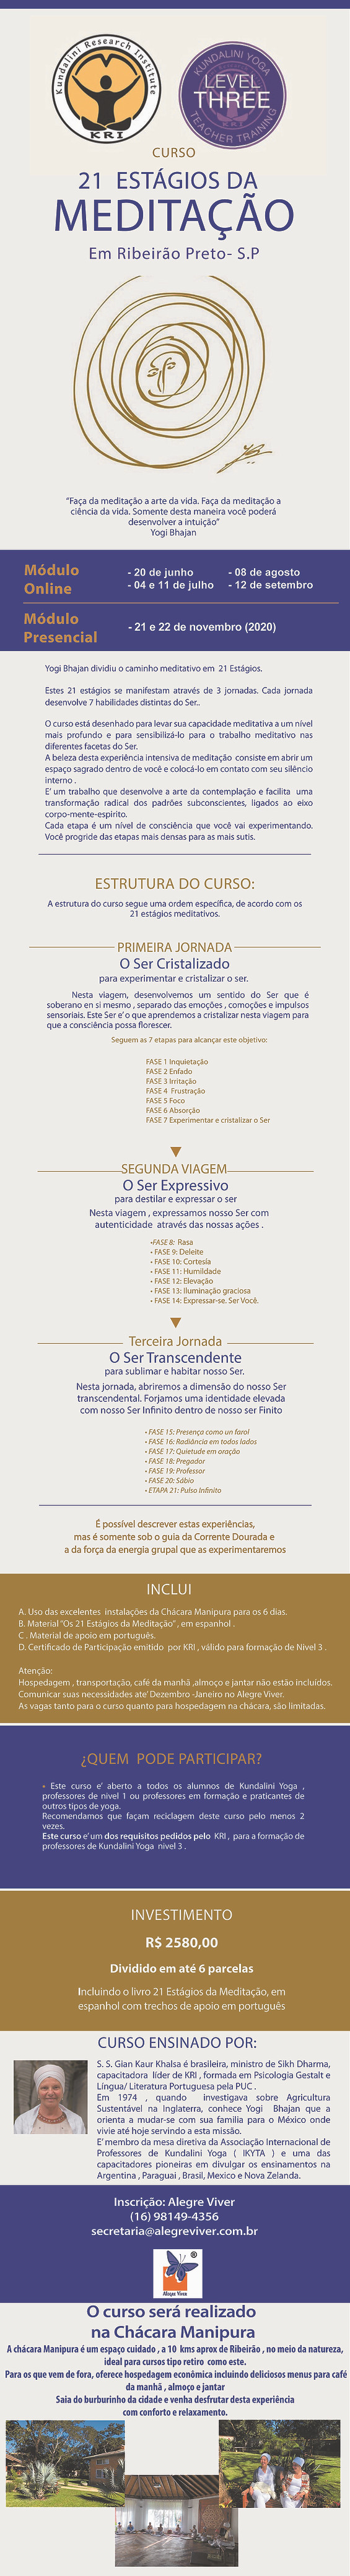 trazos_21_etapas_portugues_v4.jpg